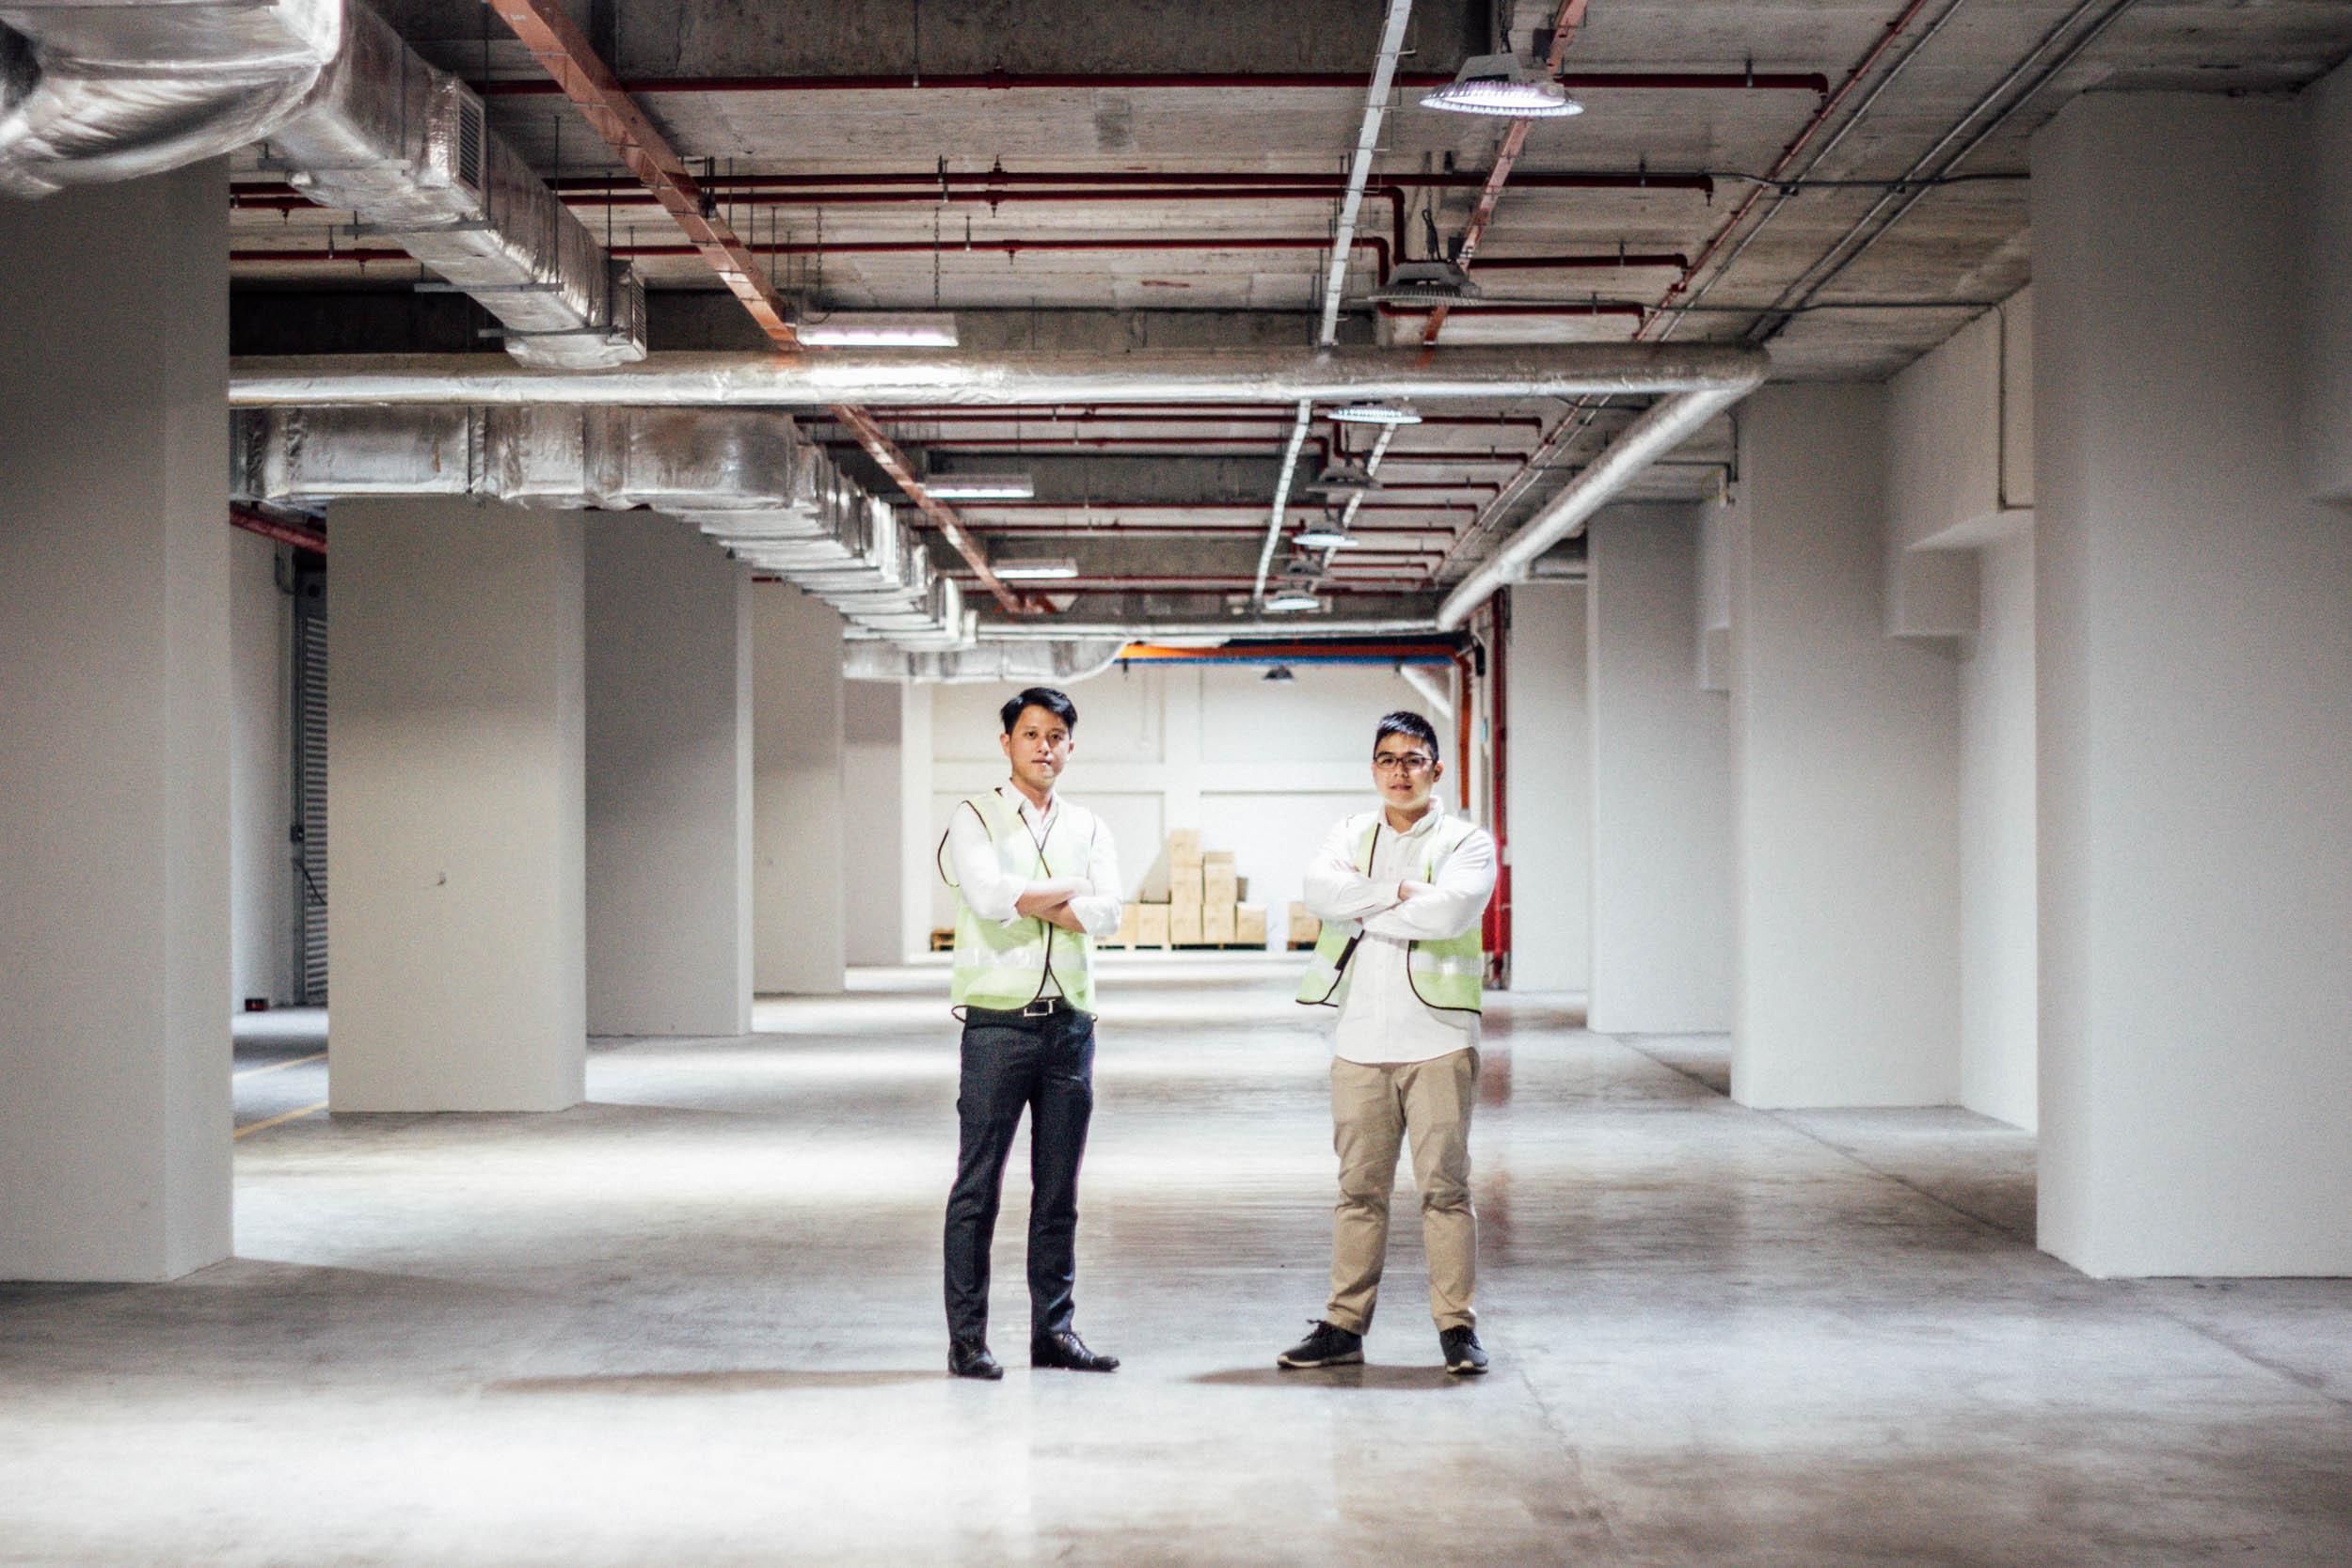 Office cum warehouse space - Spacelab